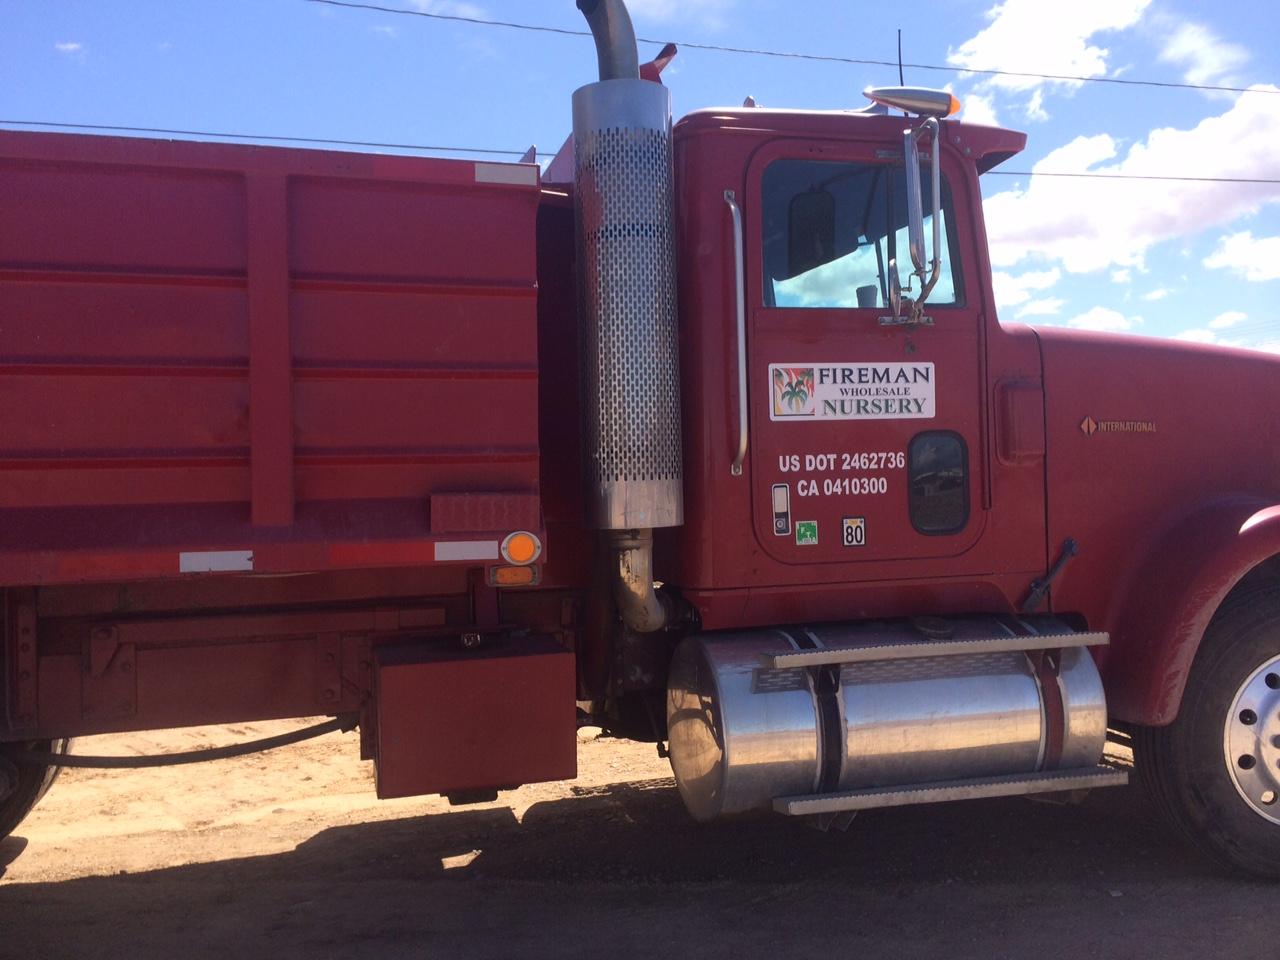 Fireman Nursery Red truck, nice!